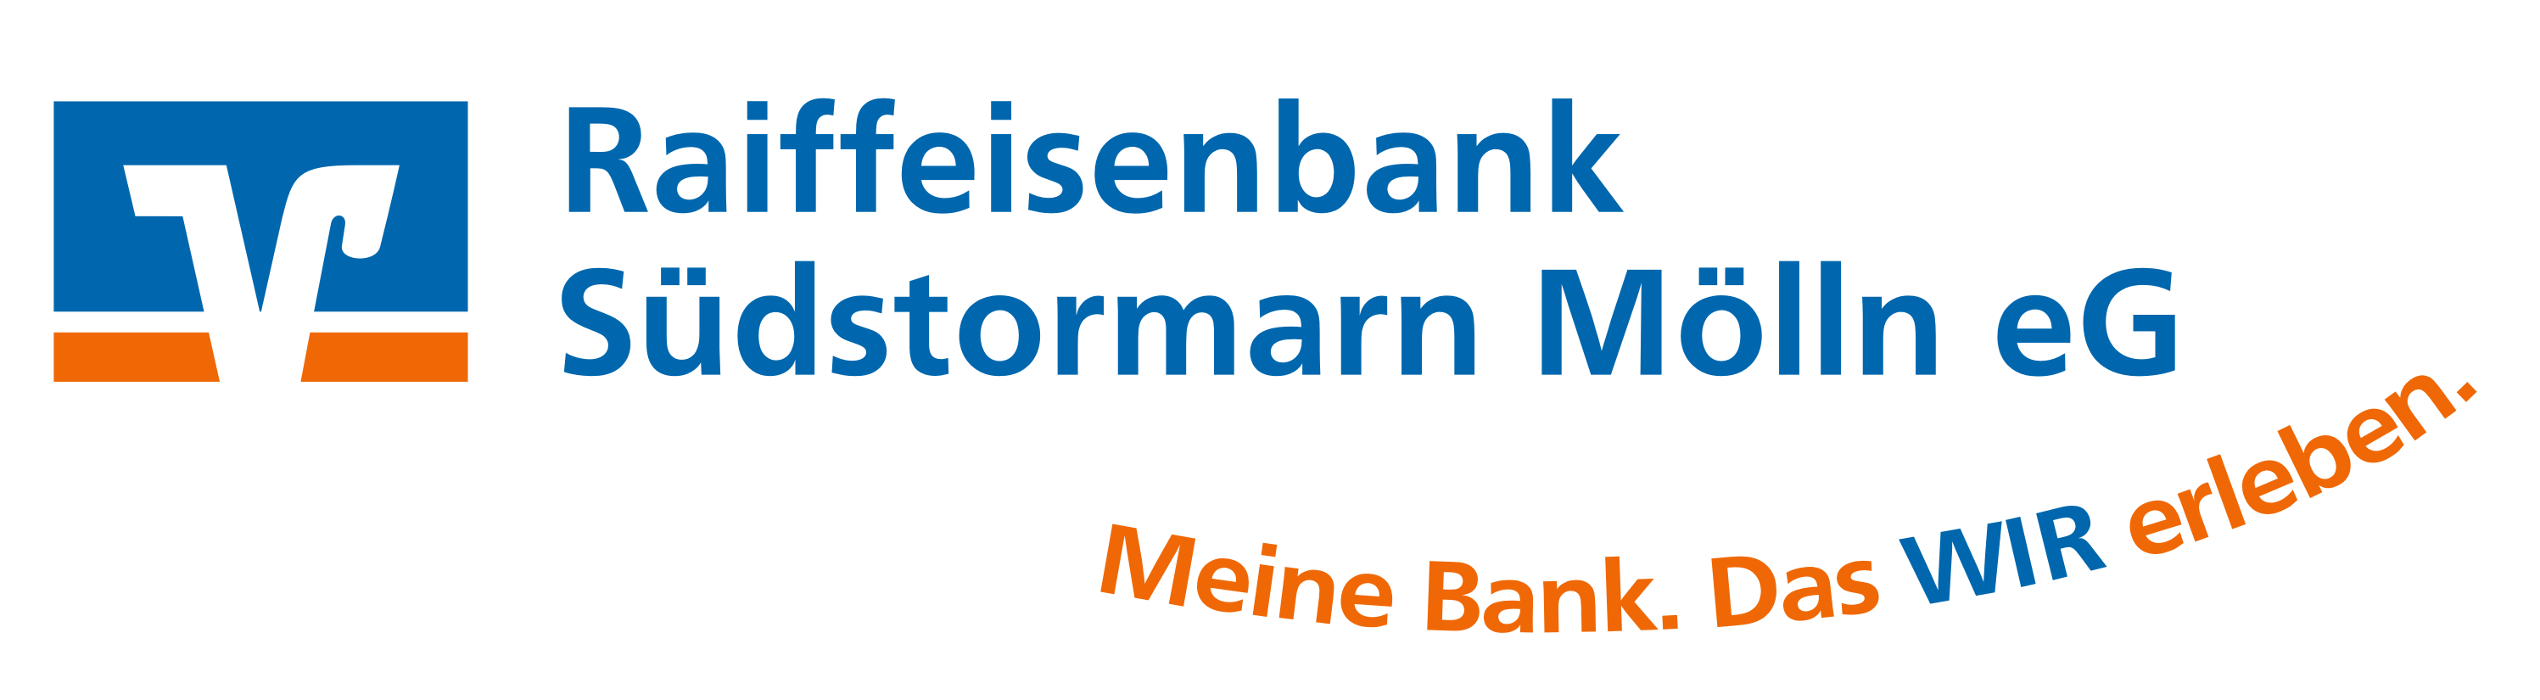 Logo von Raiffeisenbank Südstormarn Mölln eG, Geschäftsstelle Großhansdorf